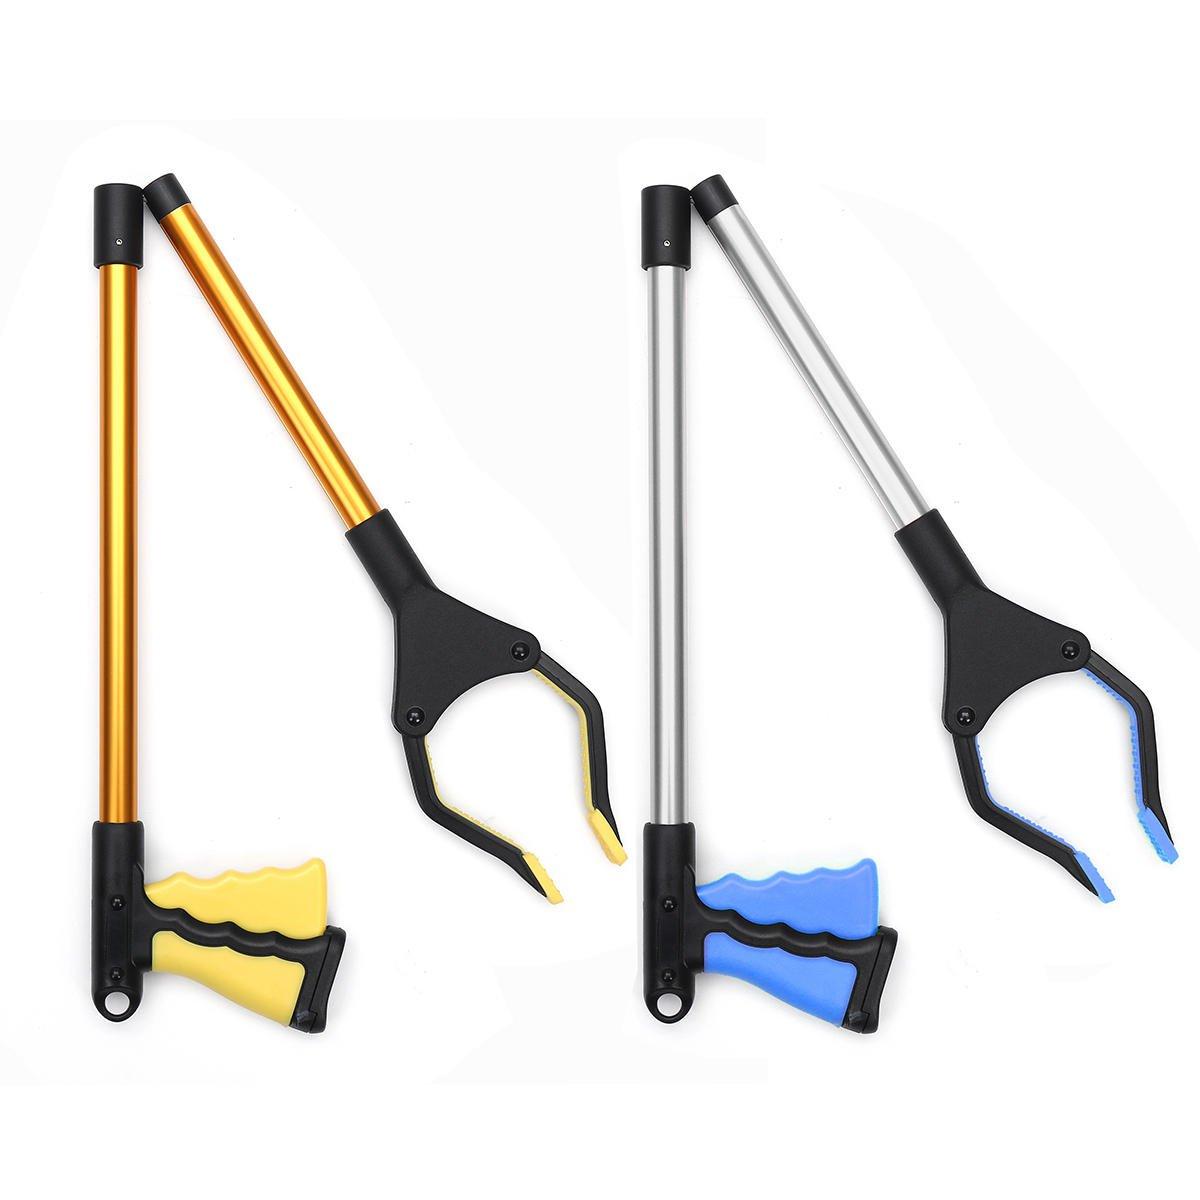 Industrial Heavy Duty Pick Up Tool Reacher Grabber Trash Rotating Hand Stick Tools Kit